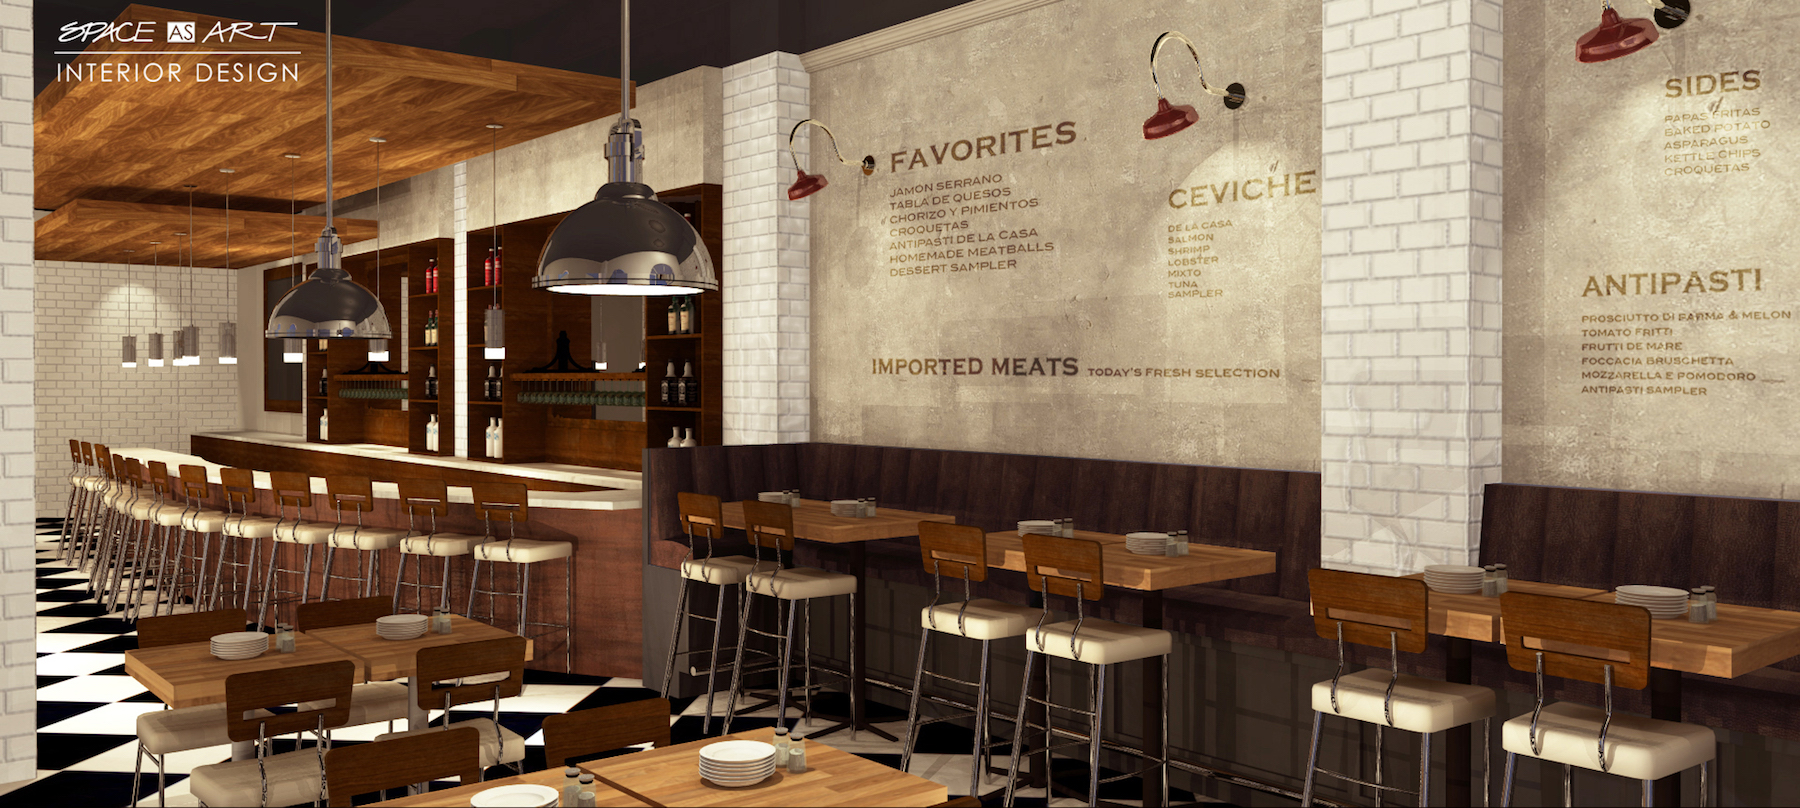 Creative Restaurant And Bar Design By Space As Art Interior Design Sarasota  Tampa